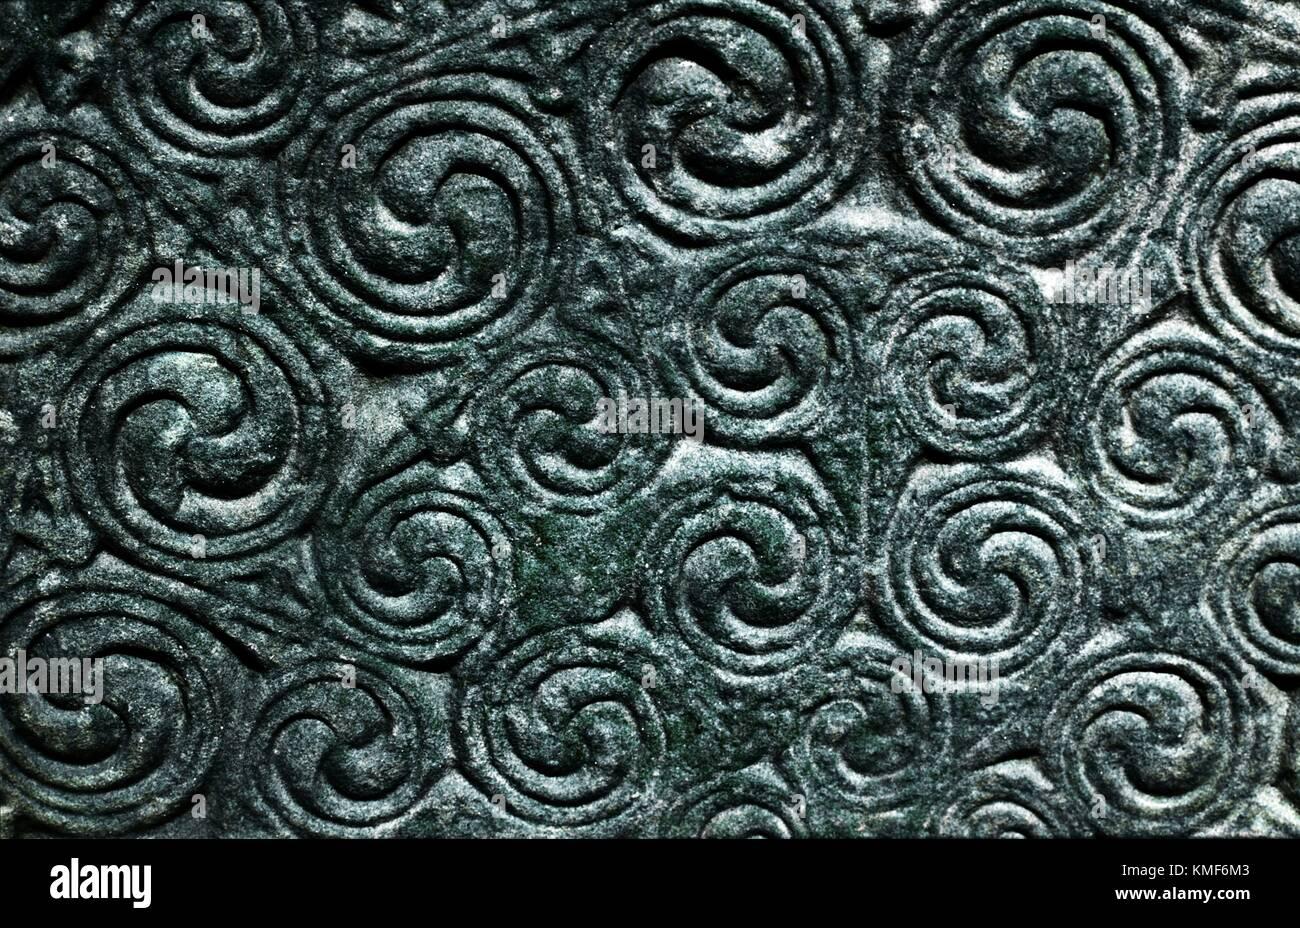 Detalle de curvilíneas talladas Pictish Celta símbolo cristiano monumento de piedra en Shandwick, Easter Ross, Región de tierras altas, Escocia Foto de stock